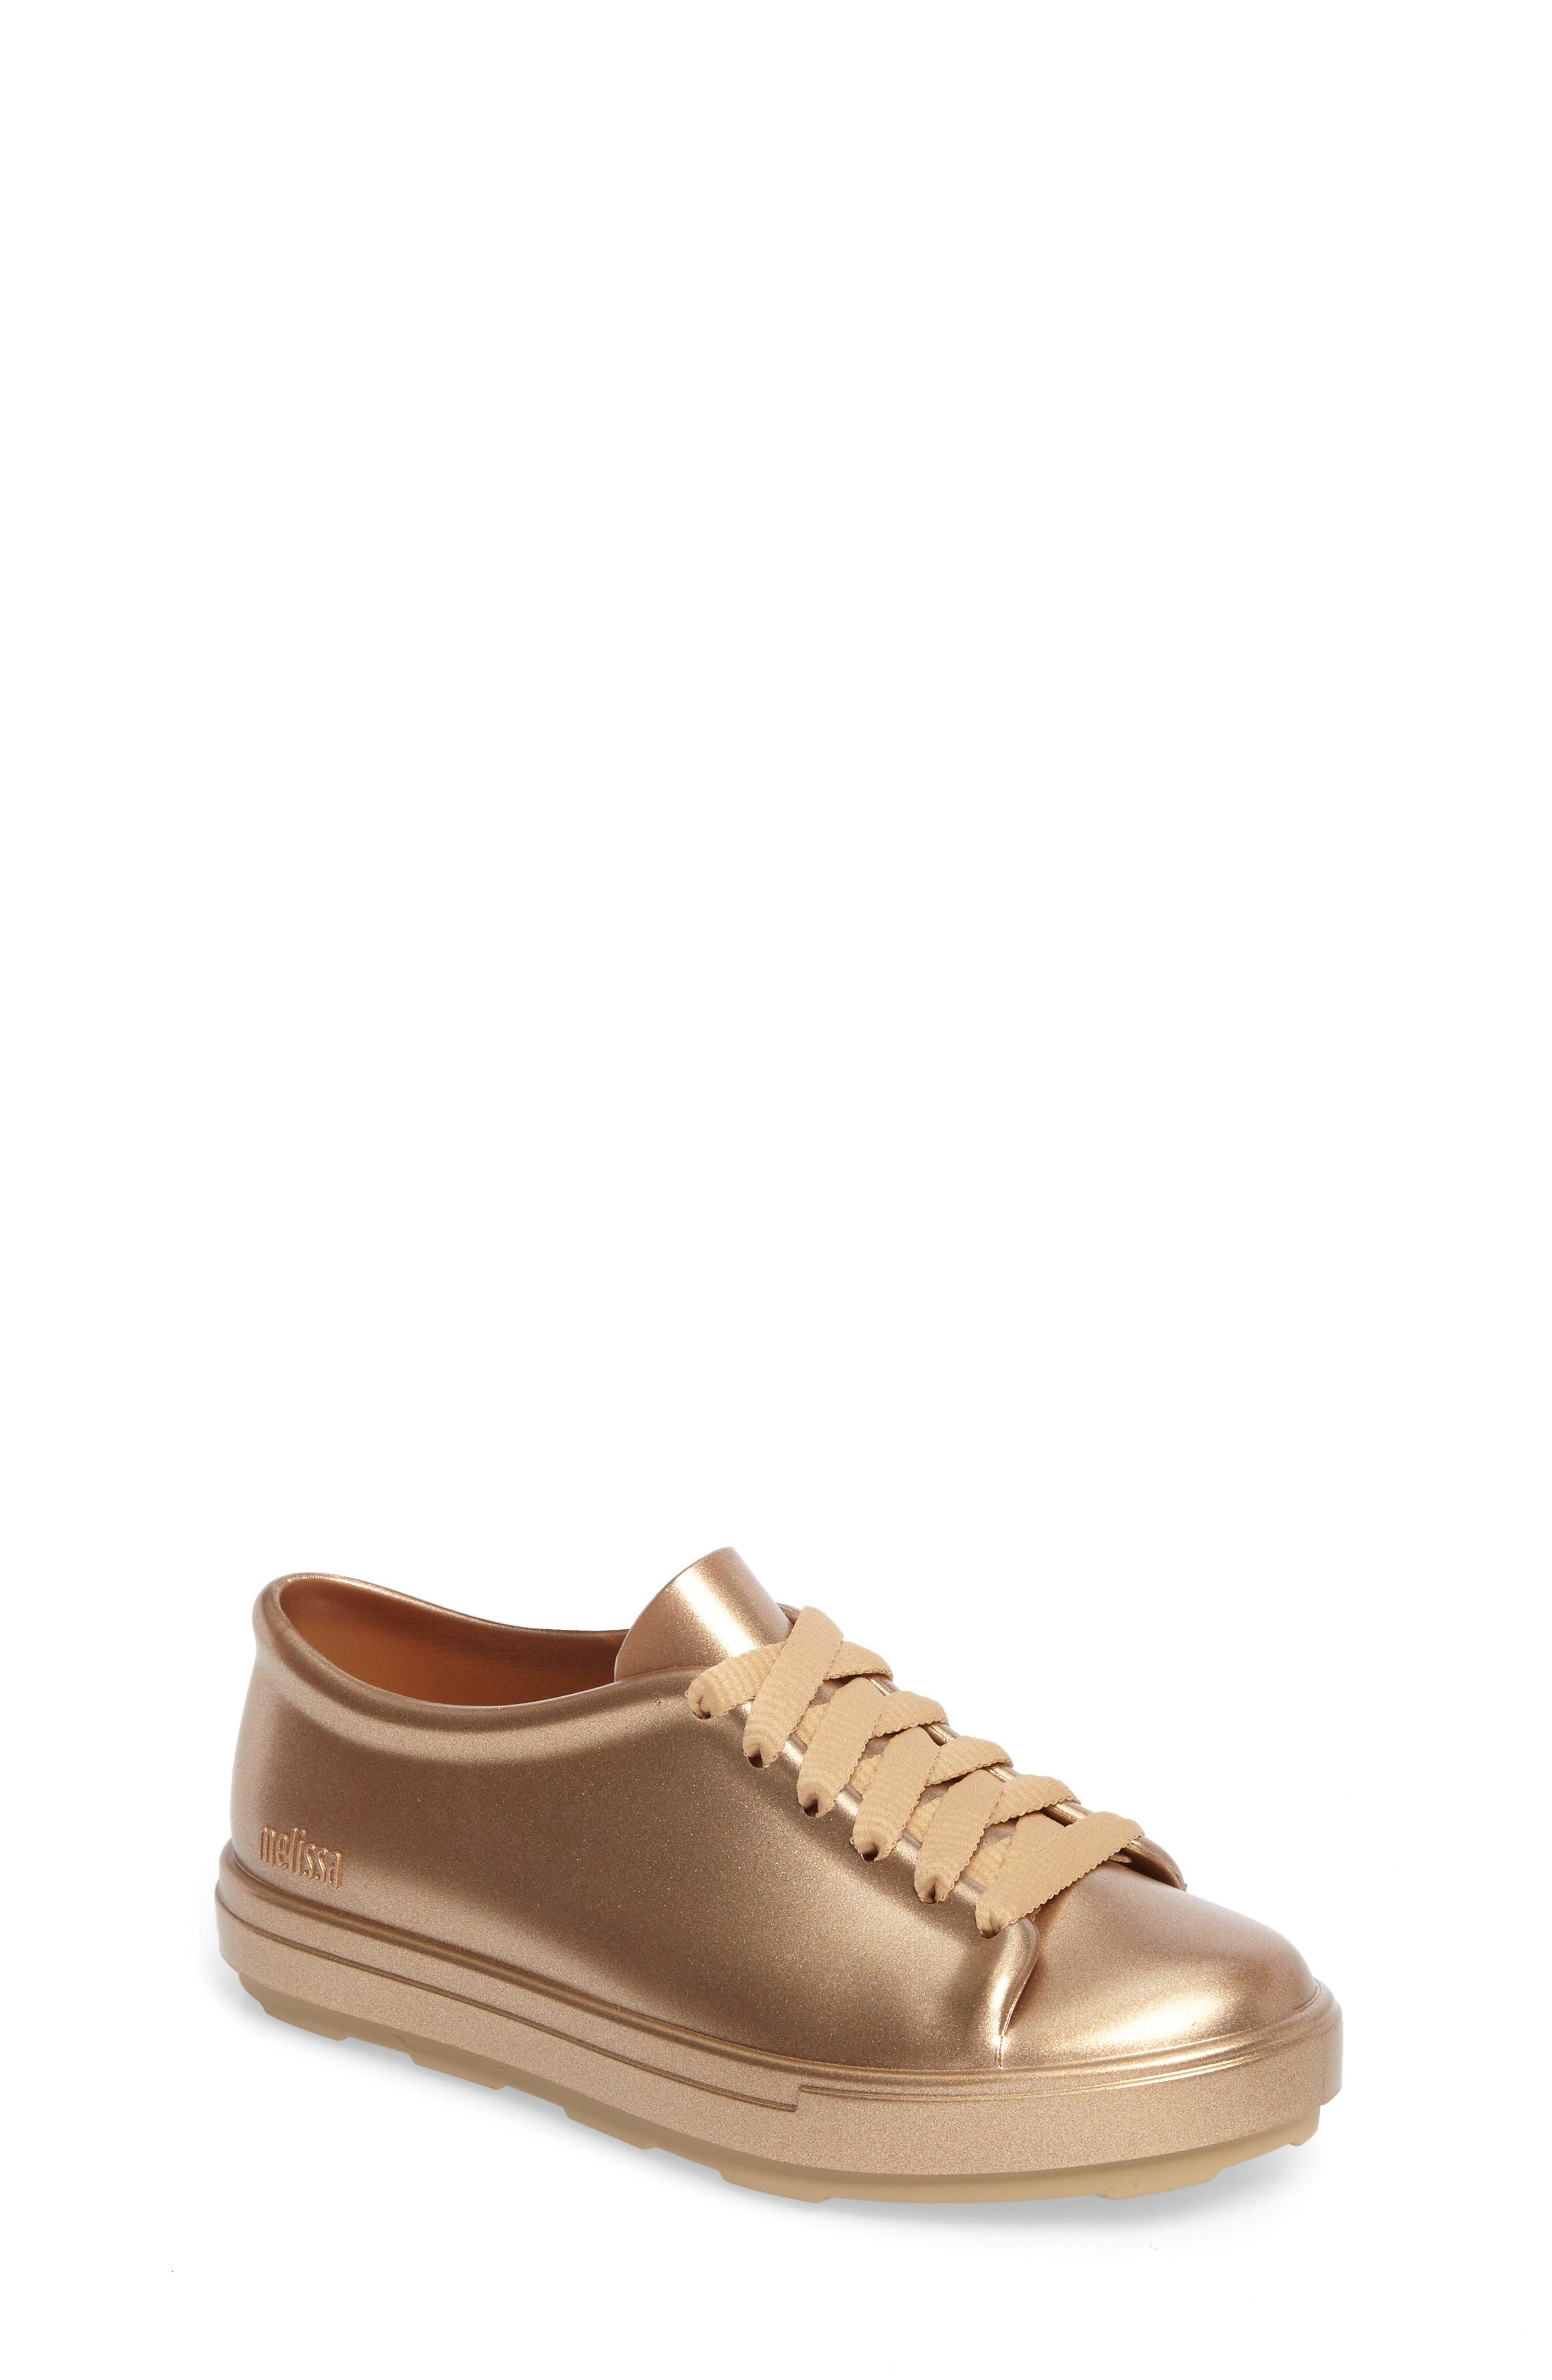 Be Shine Sneaker,                         Main,                         color, 710